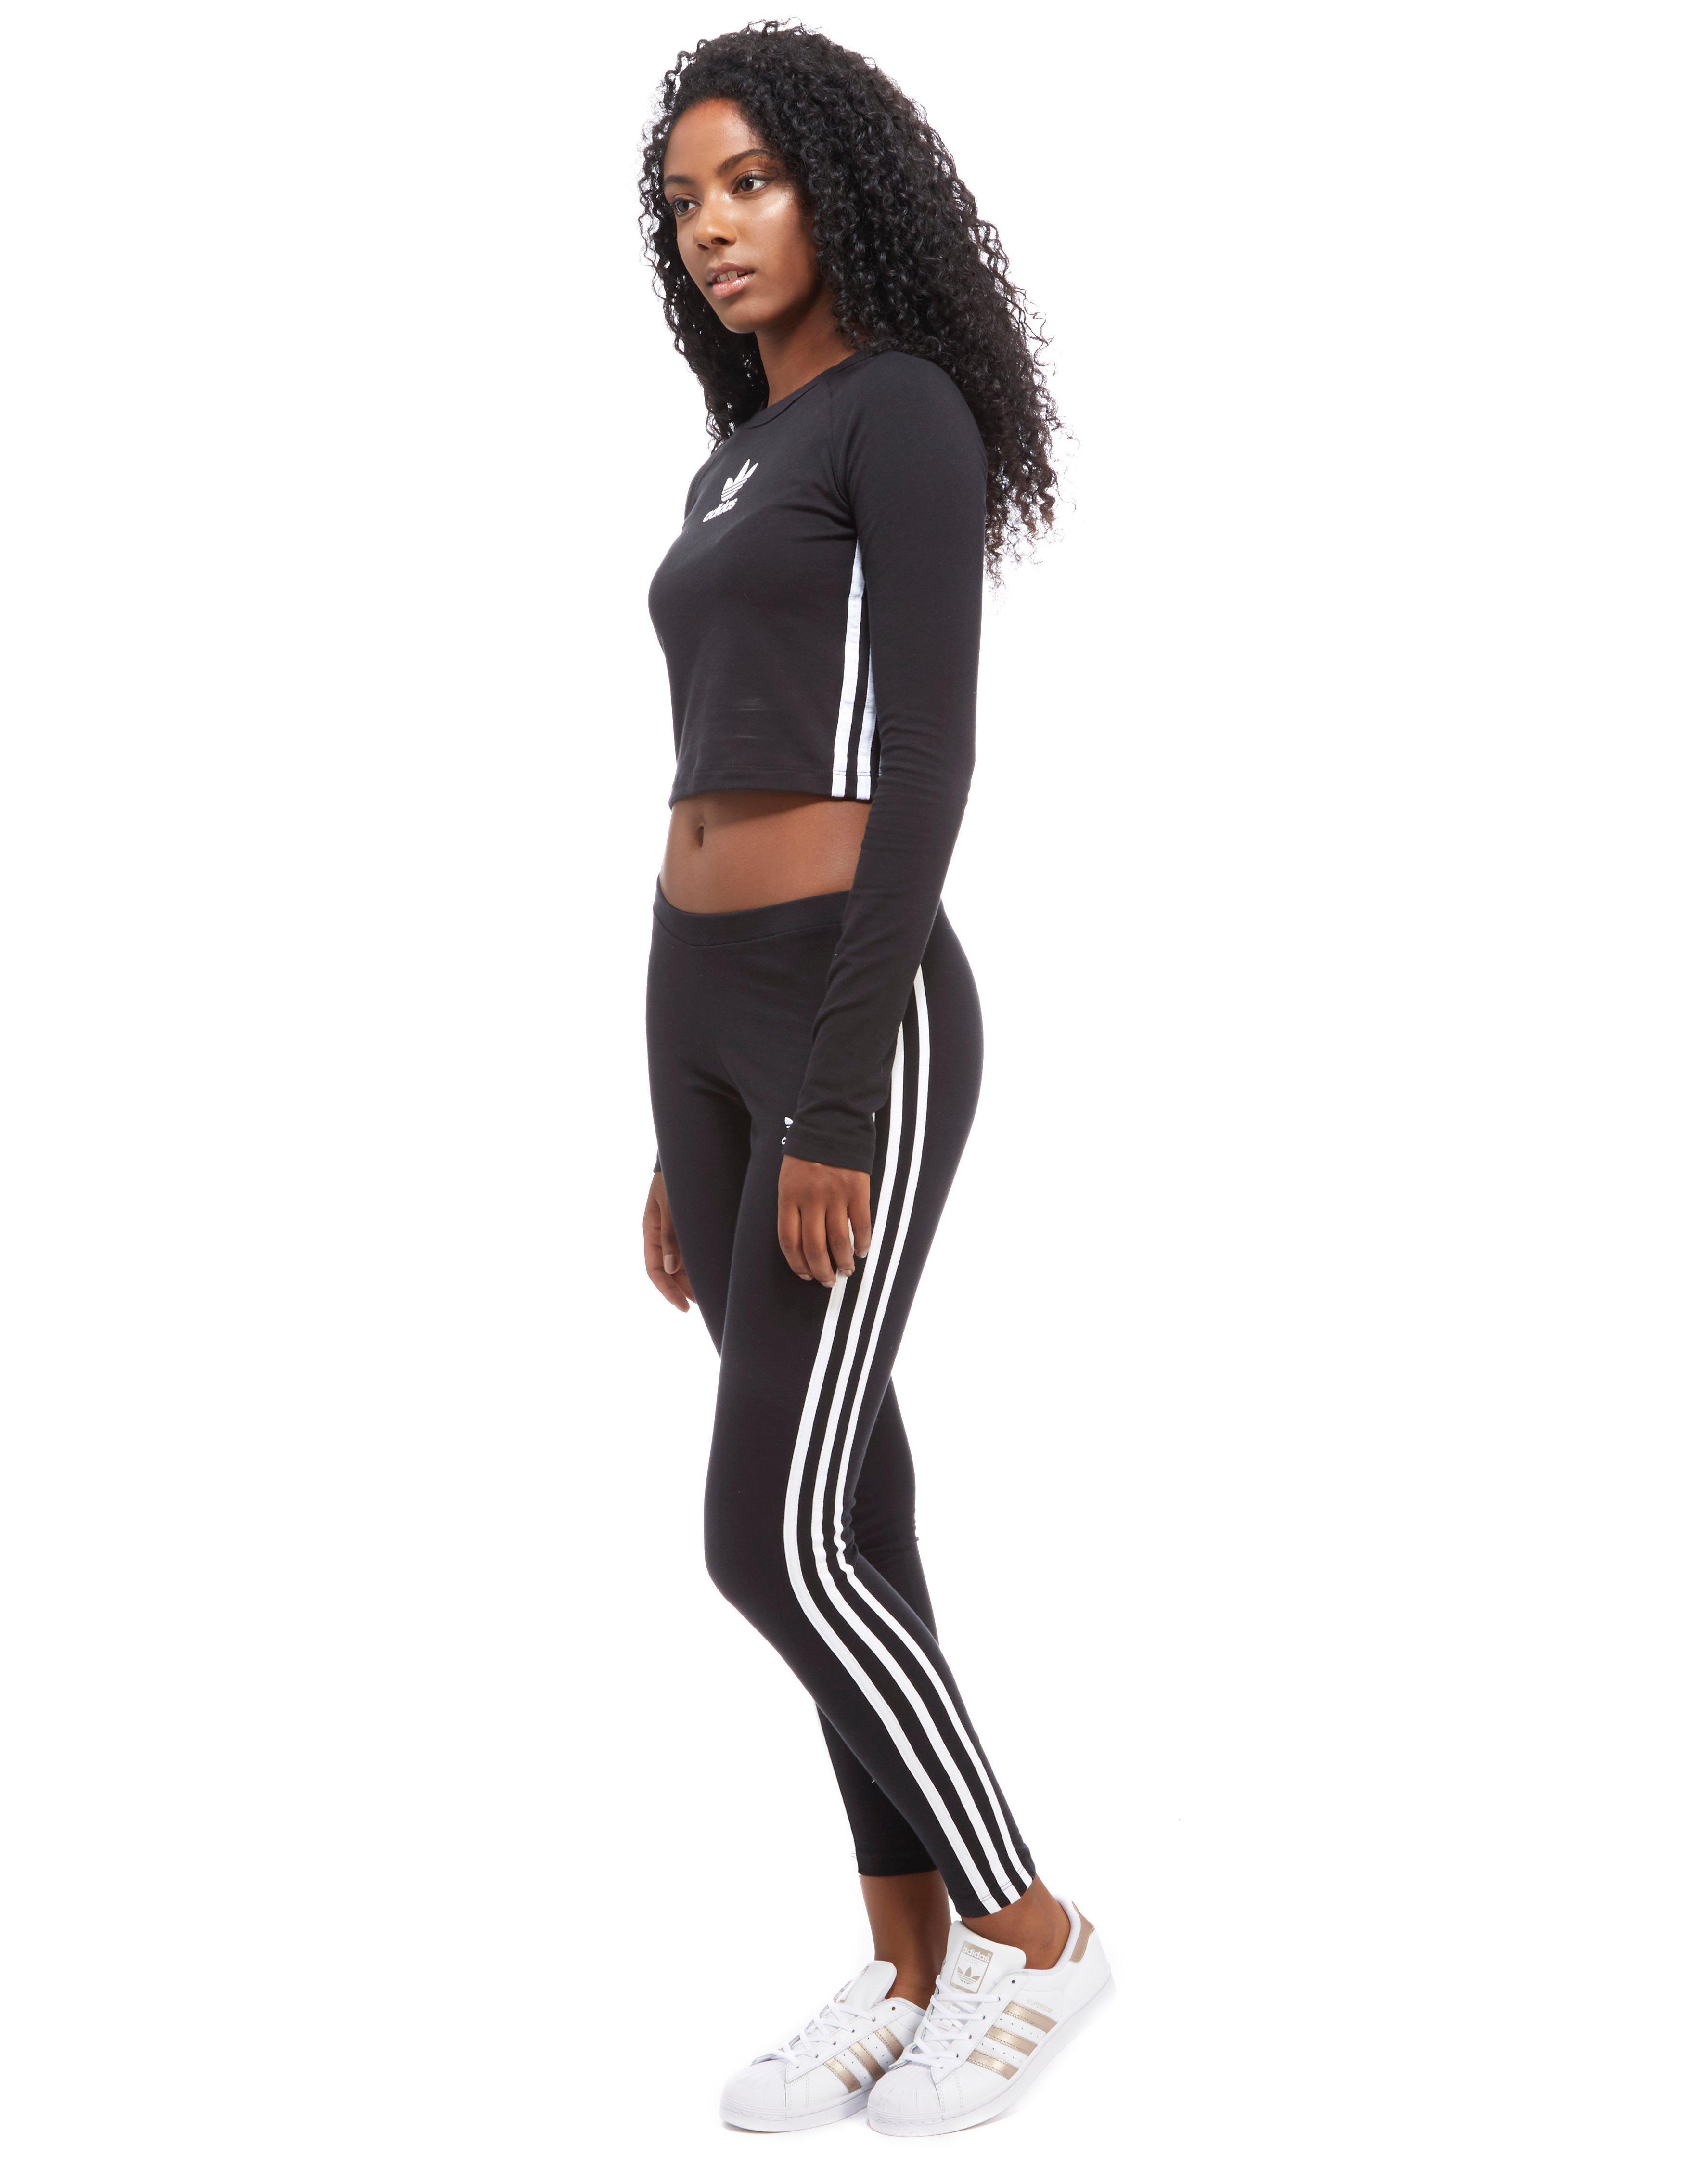 42d5e6d857a Lyst - adidas Originals 3-stripes Long Sleeve Crop in Black